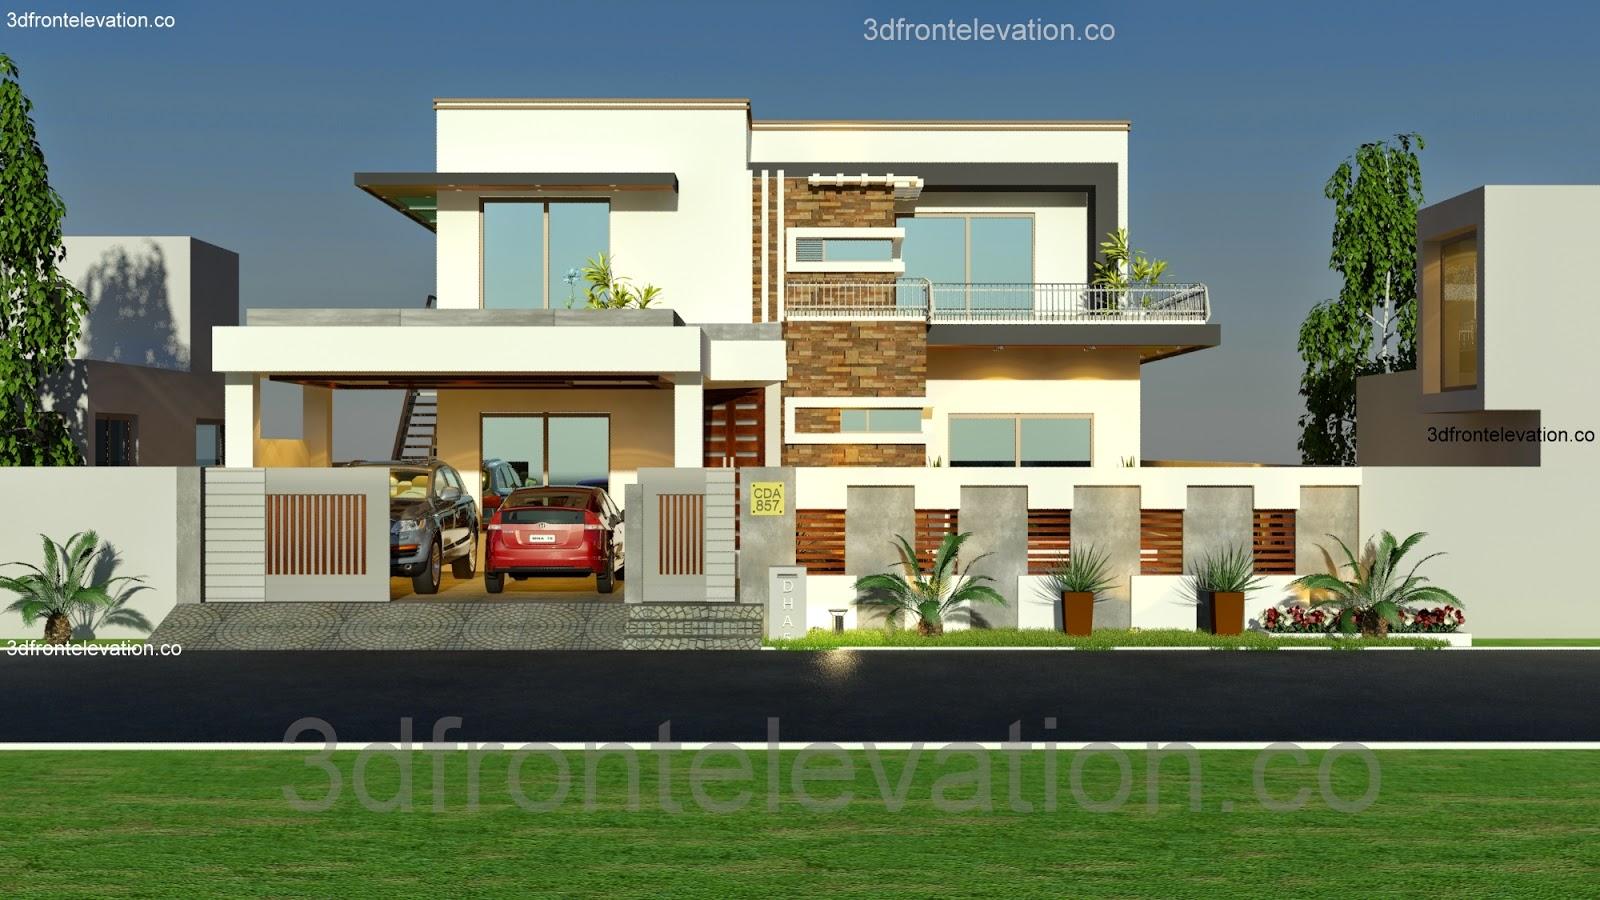 3D Front Elevation.com: 1 Kanal House Plan Layout 50u0027 X 90 .